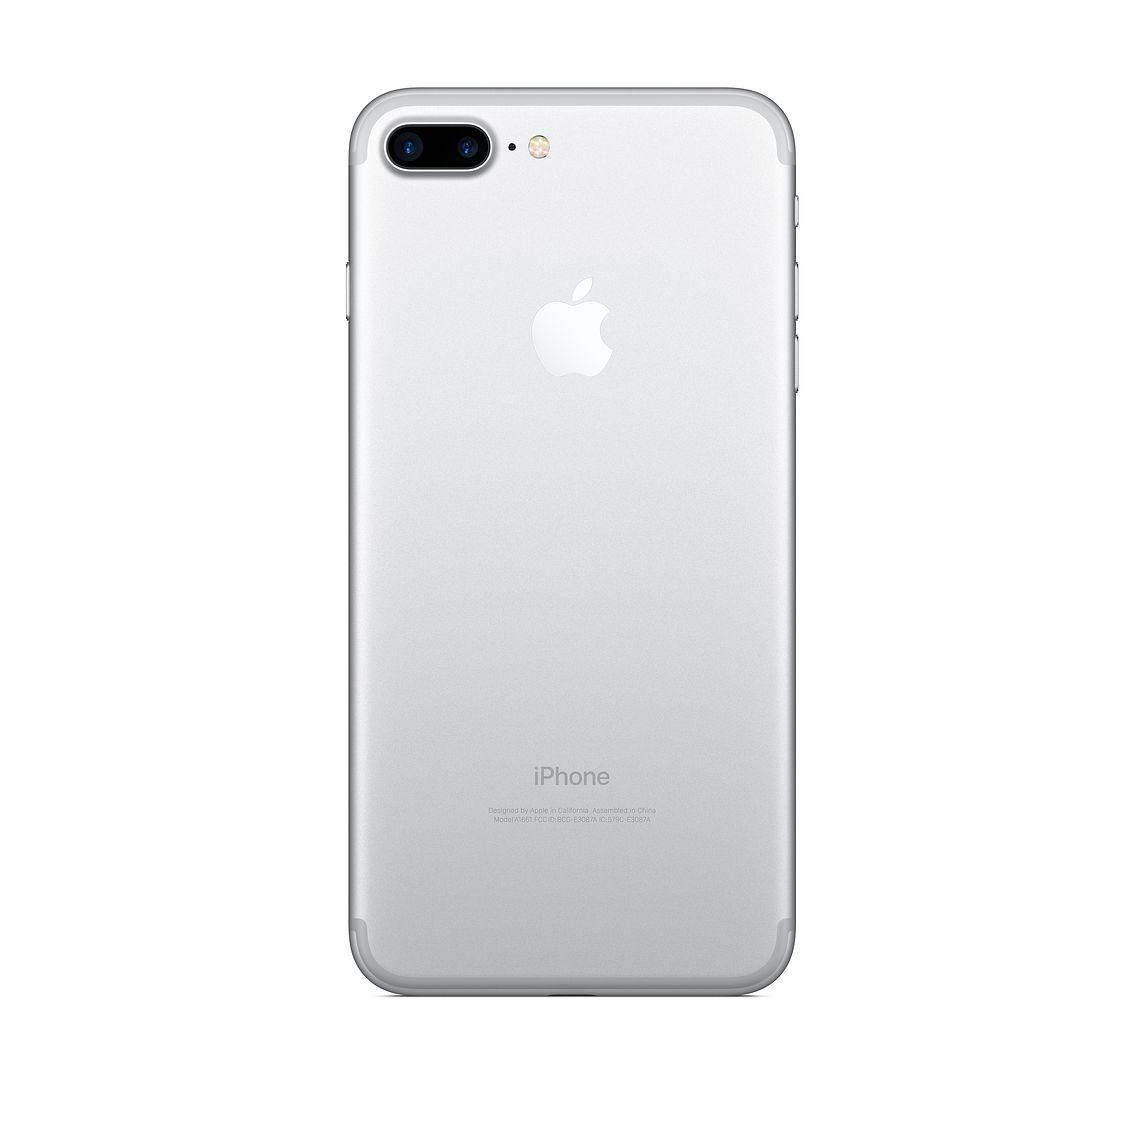 Refurbished Iphone 7 Plus 128gb Rose Gold Unlocked Apple With Images Iphone 7 Plus Iphone Iphone 7